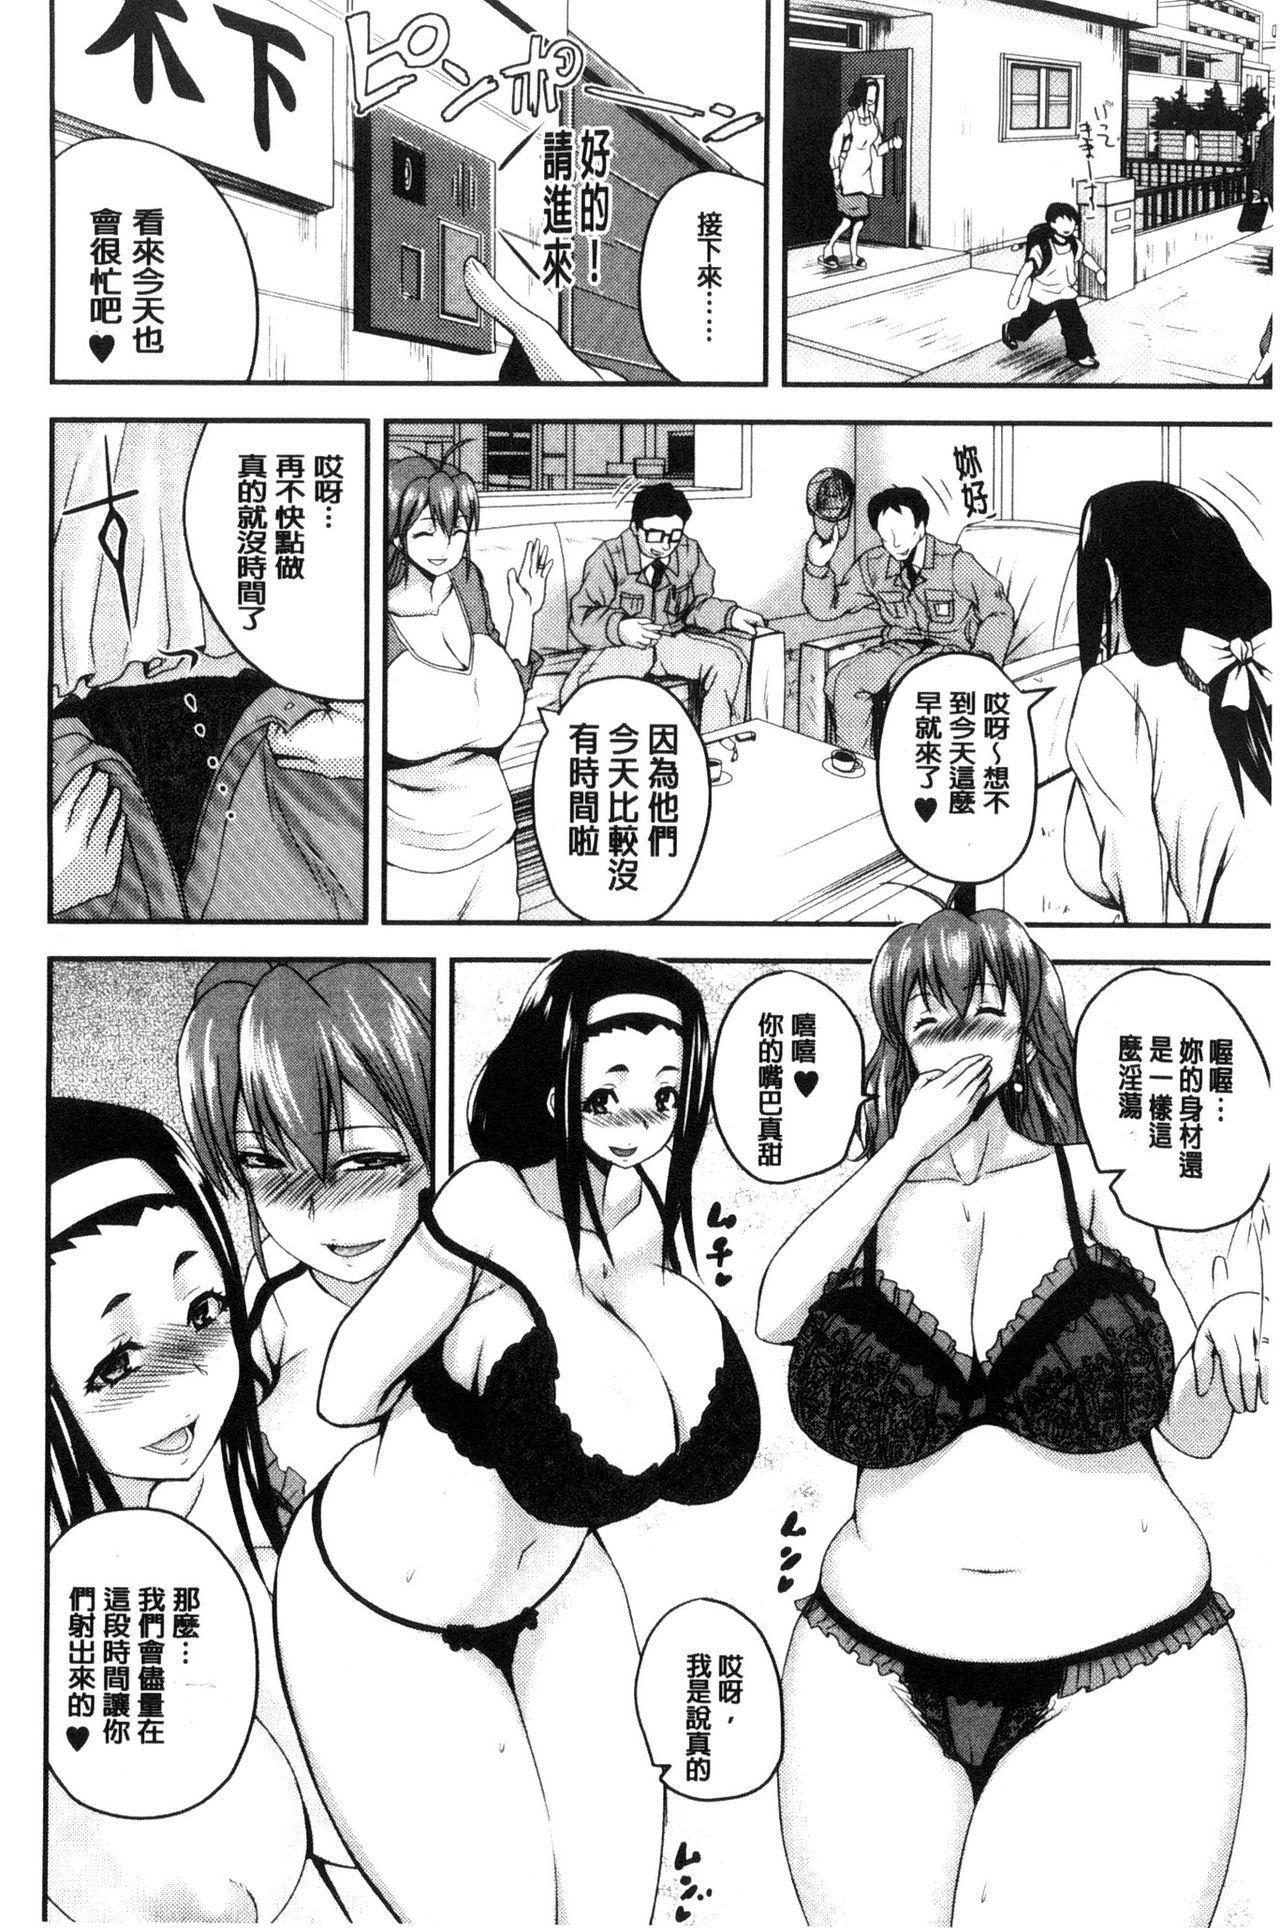 Opink Health Seibo no Fukuin 158